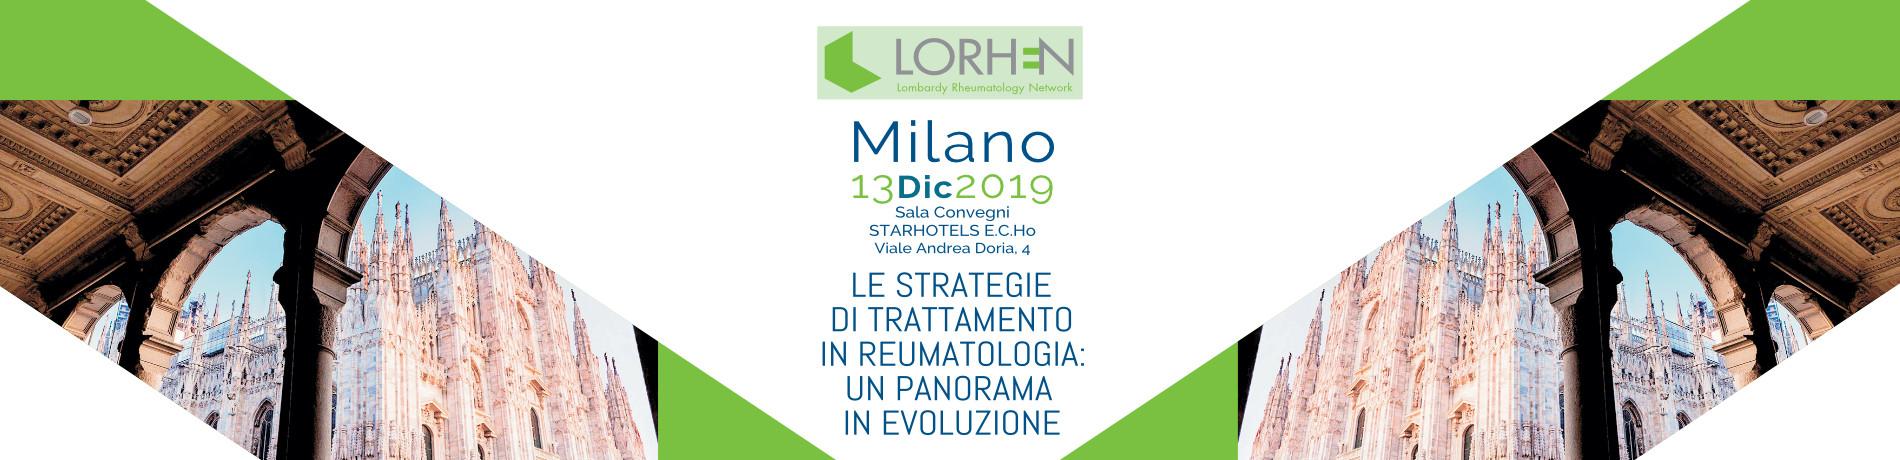 http://www.formedica.it/wp/wp-content/uploads/2019/11/2019_12_13_Le-strategie-di-trattamento-in-reumatologia.jpg